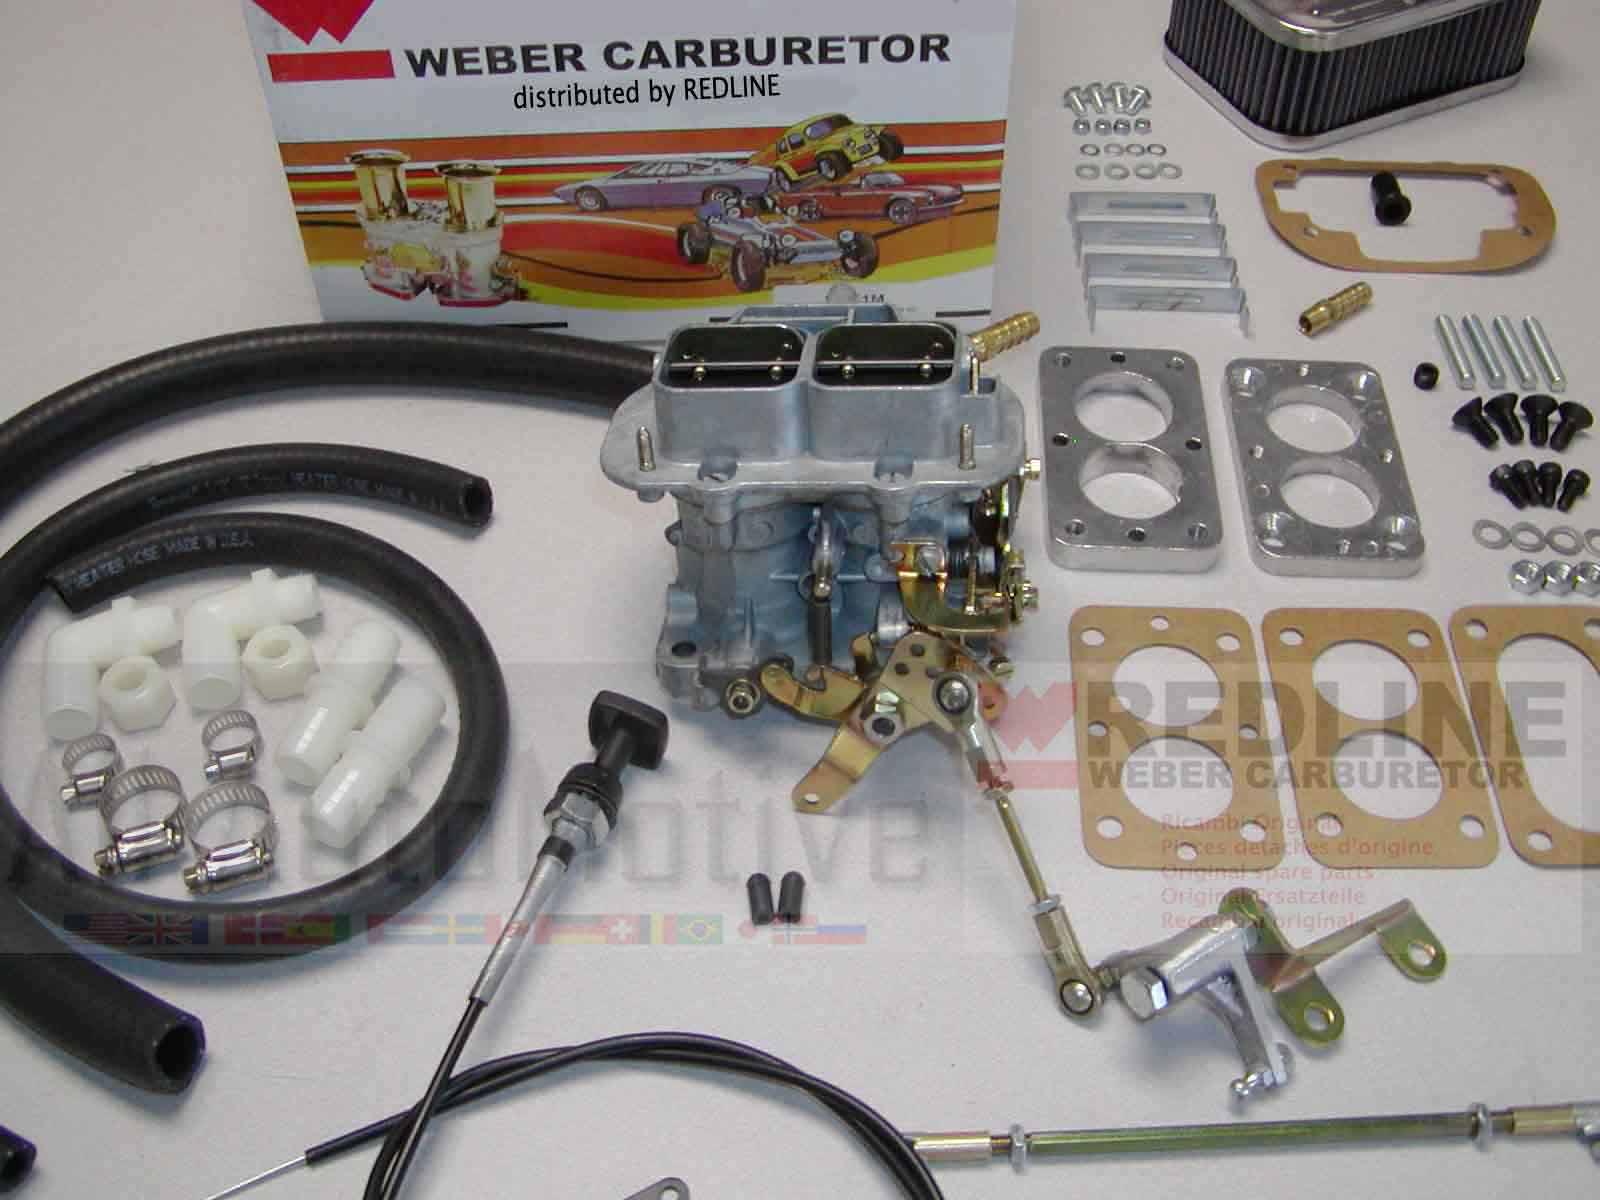 JEEP CJ7 Wrangler Cherokee 258 for WEBER DGEV Adapter Plate Kit w//gskts /& Hrdw